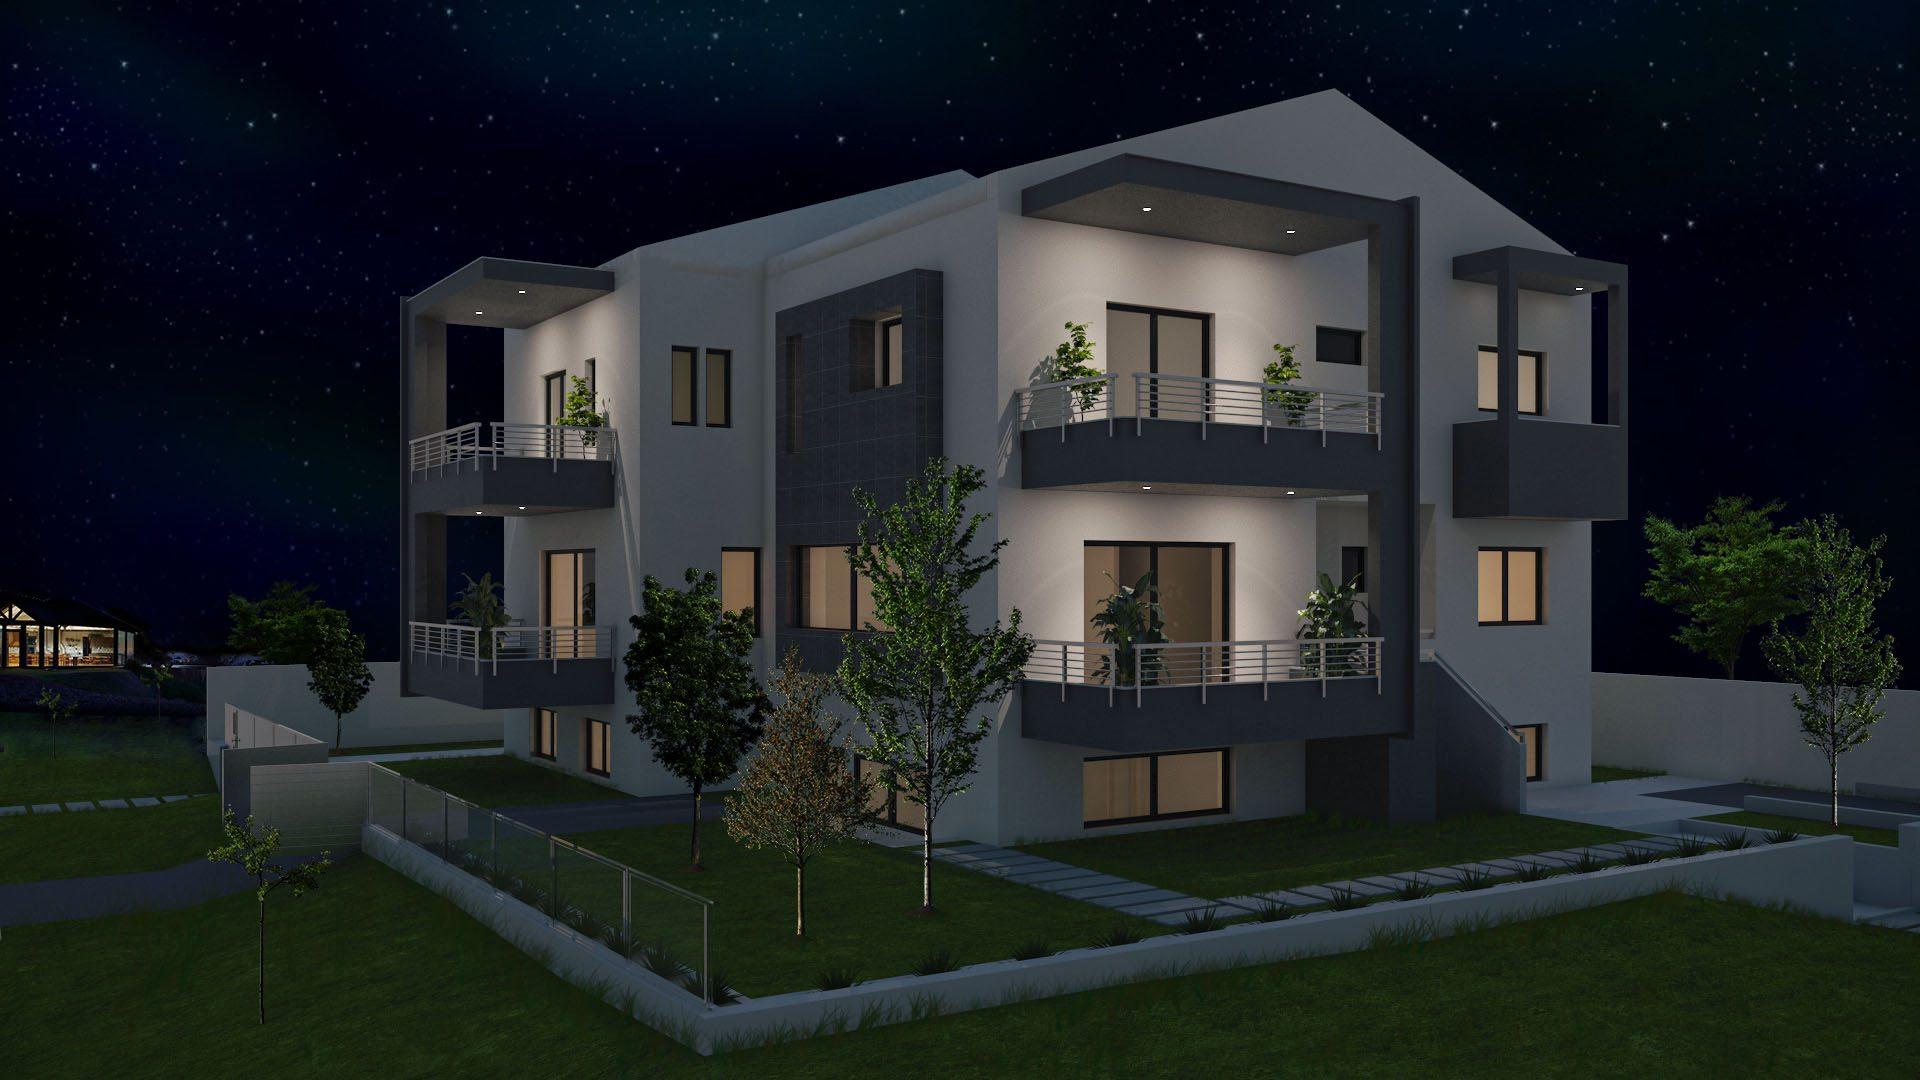 archicostudio_oreokastro_exterior-night